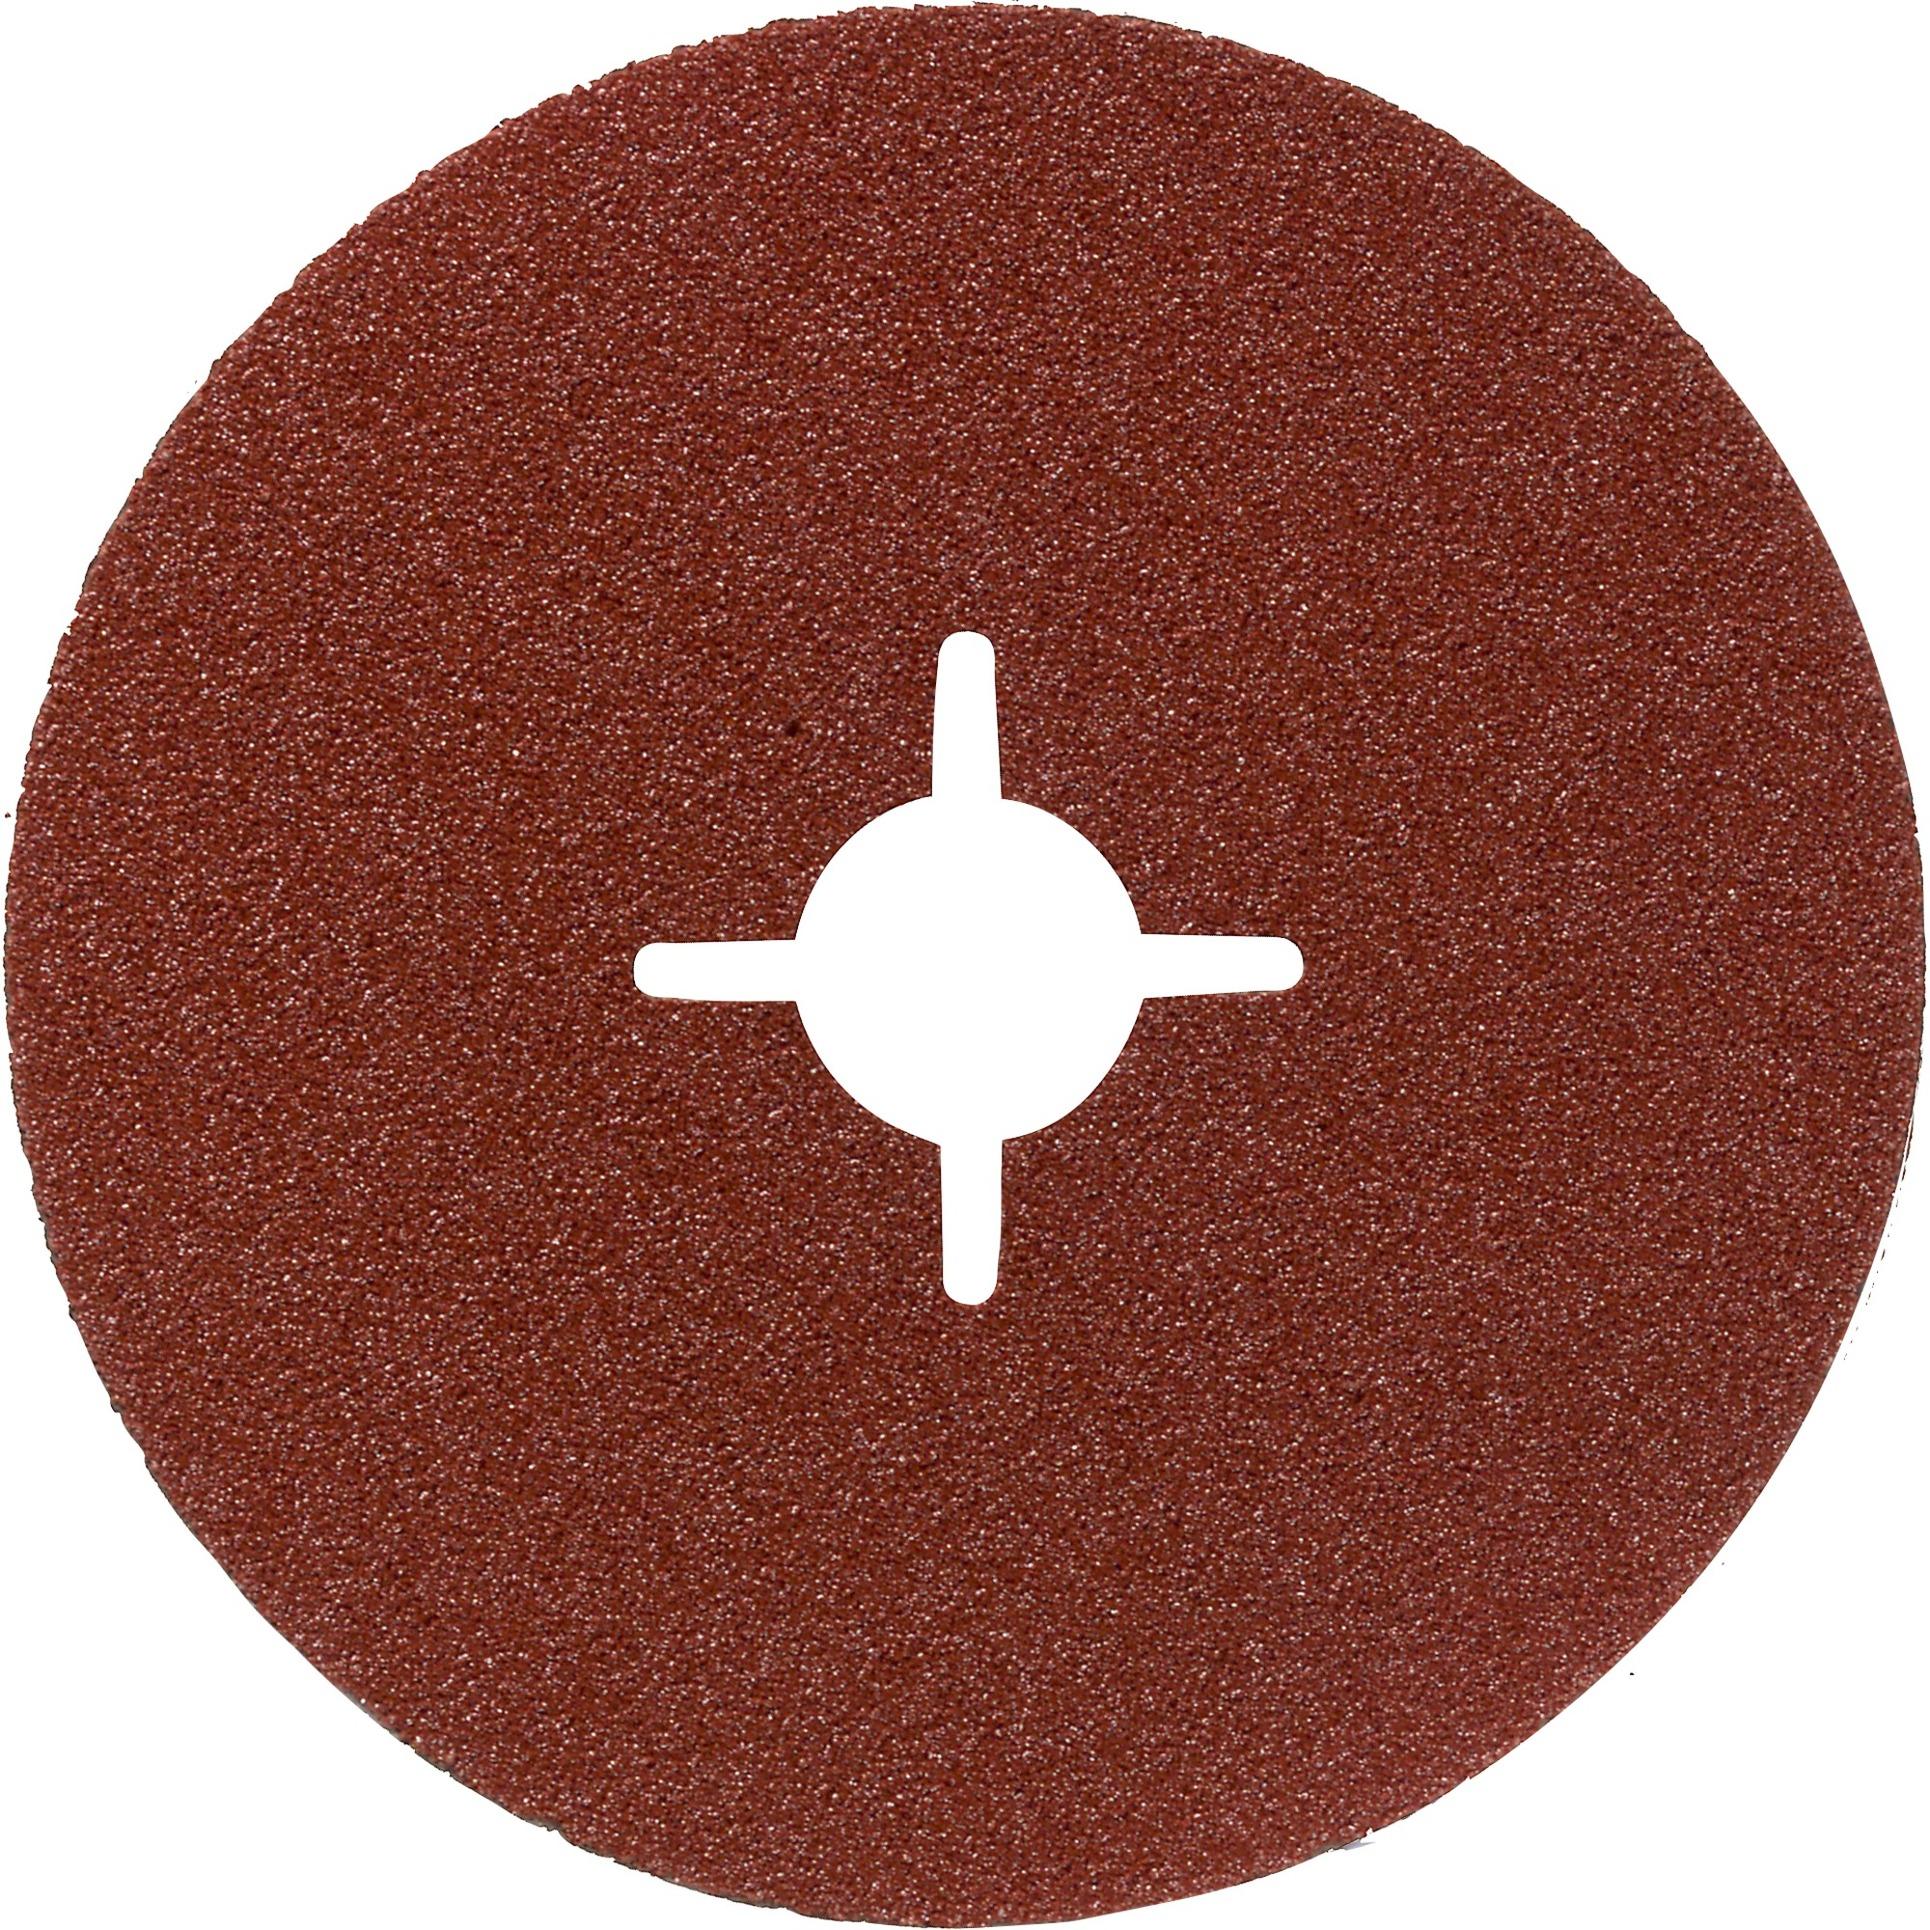 expert-for-metal-r444-slibeskive-1pcs-slibe-polermaskiner